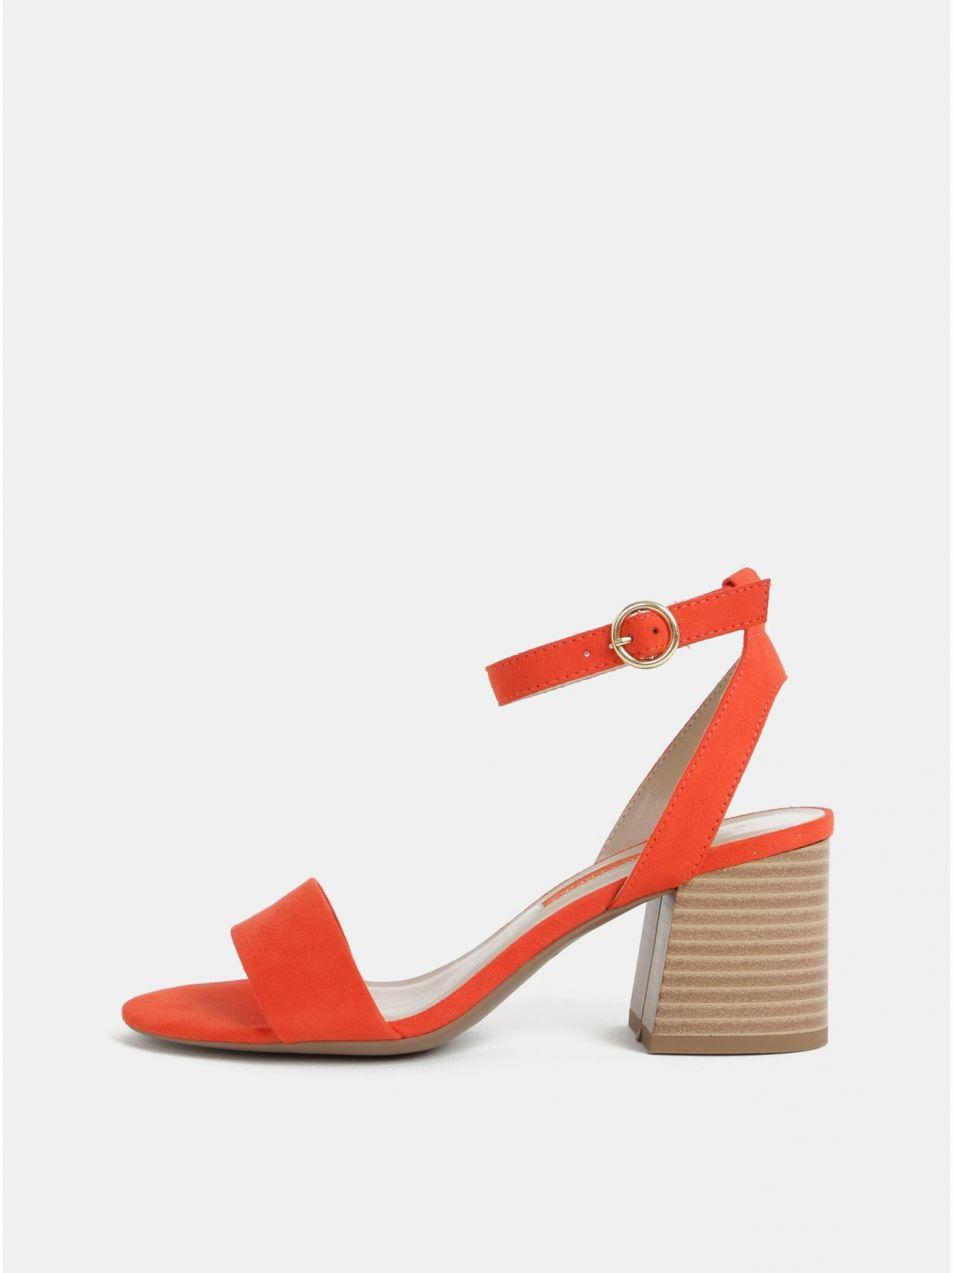 52c460b187c0 Červené sandálky Dorothy Perkins značky Dorothy Perkins - Lovely.sk